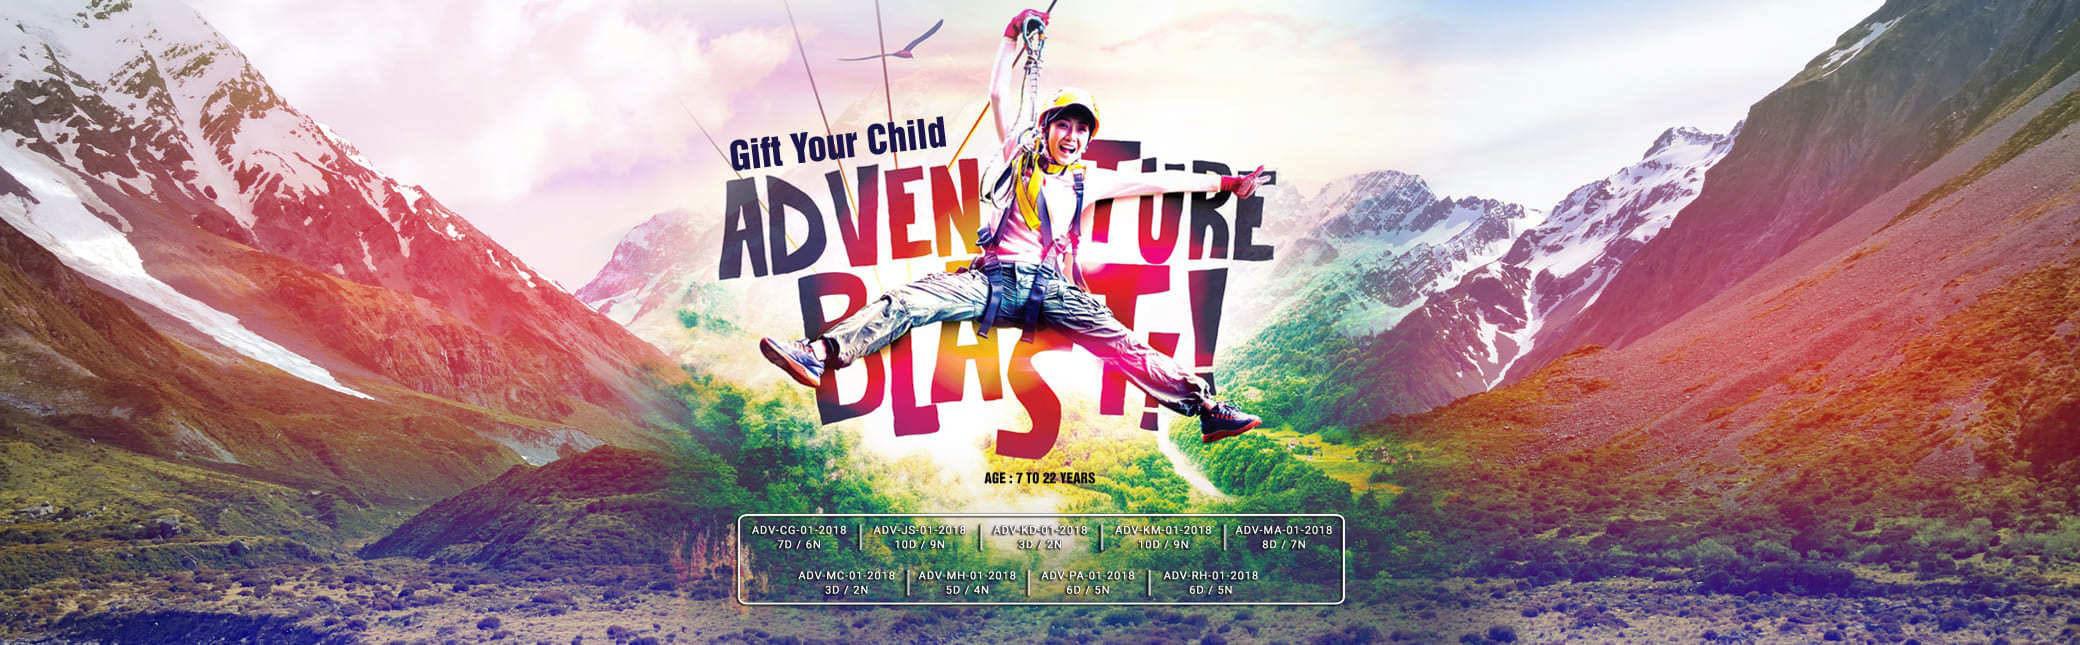 Adventure Tour Packages